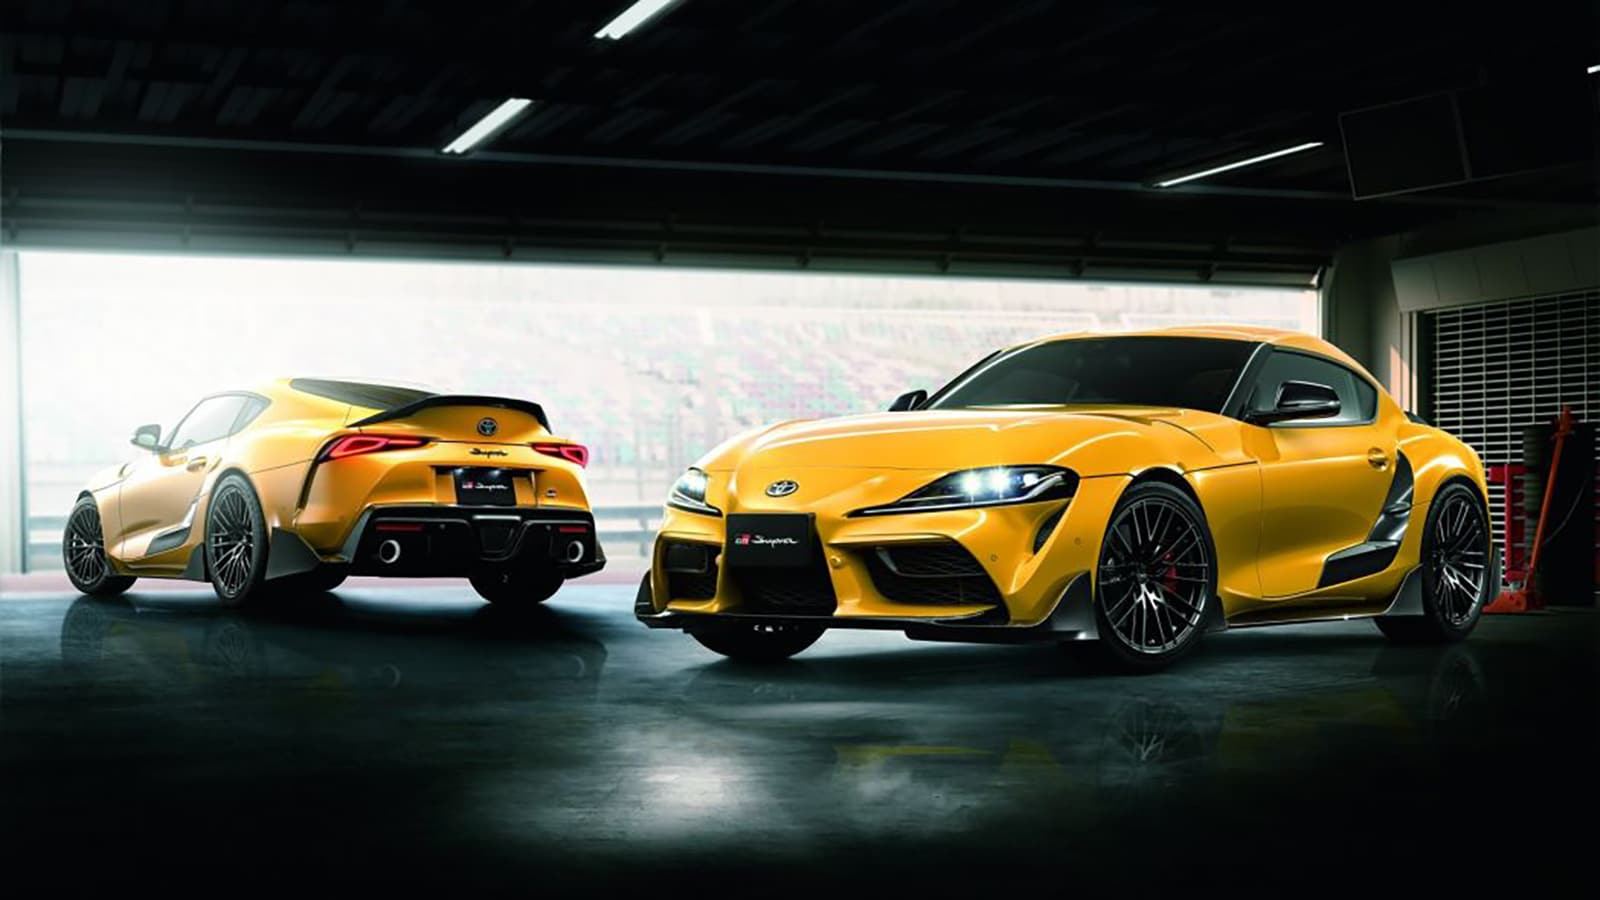 2020 Toyota Supra TRD Performance Line